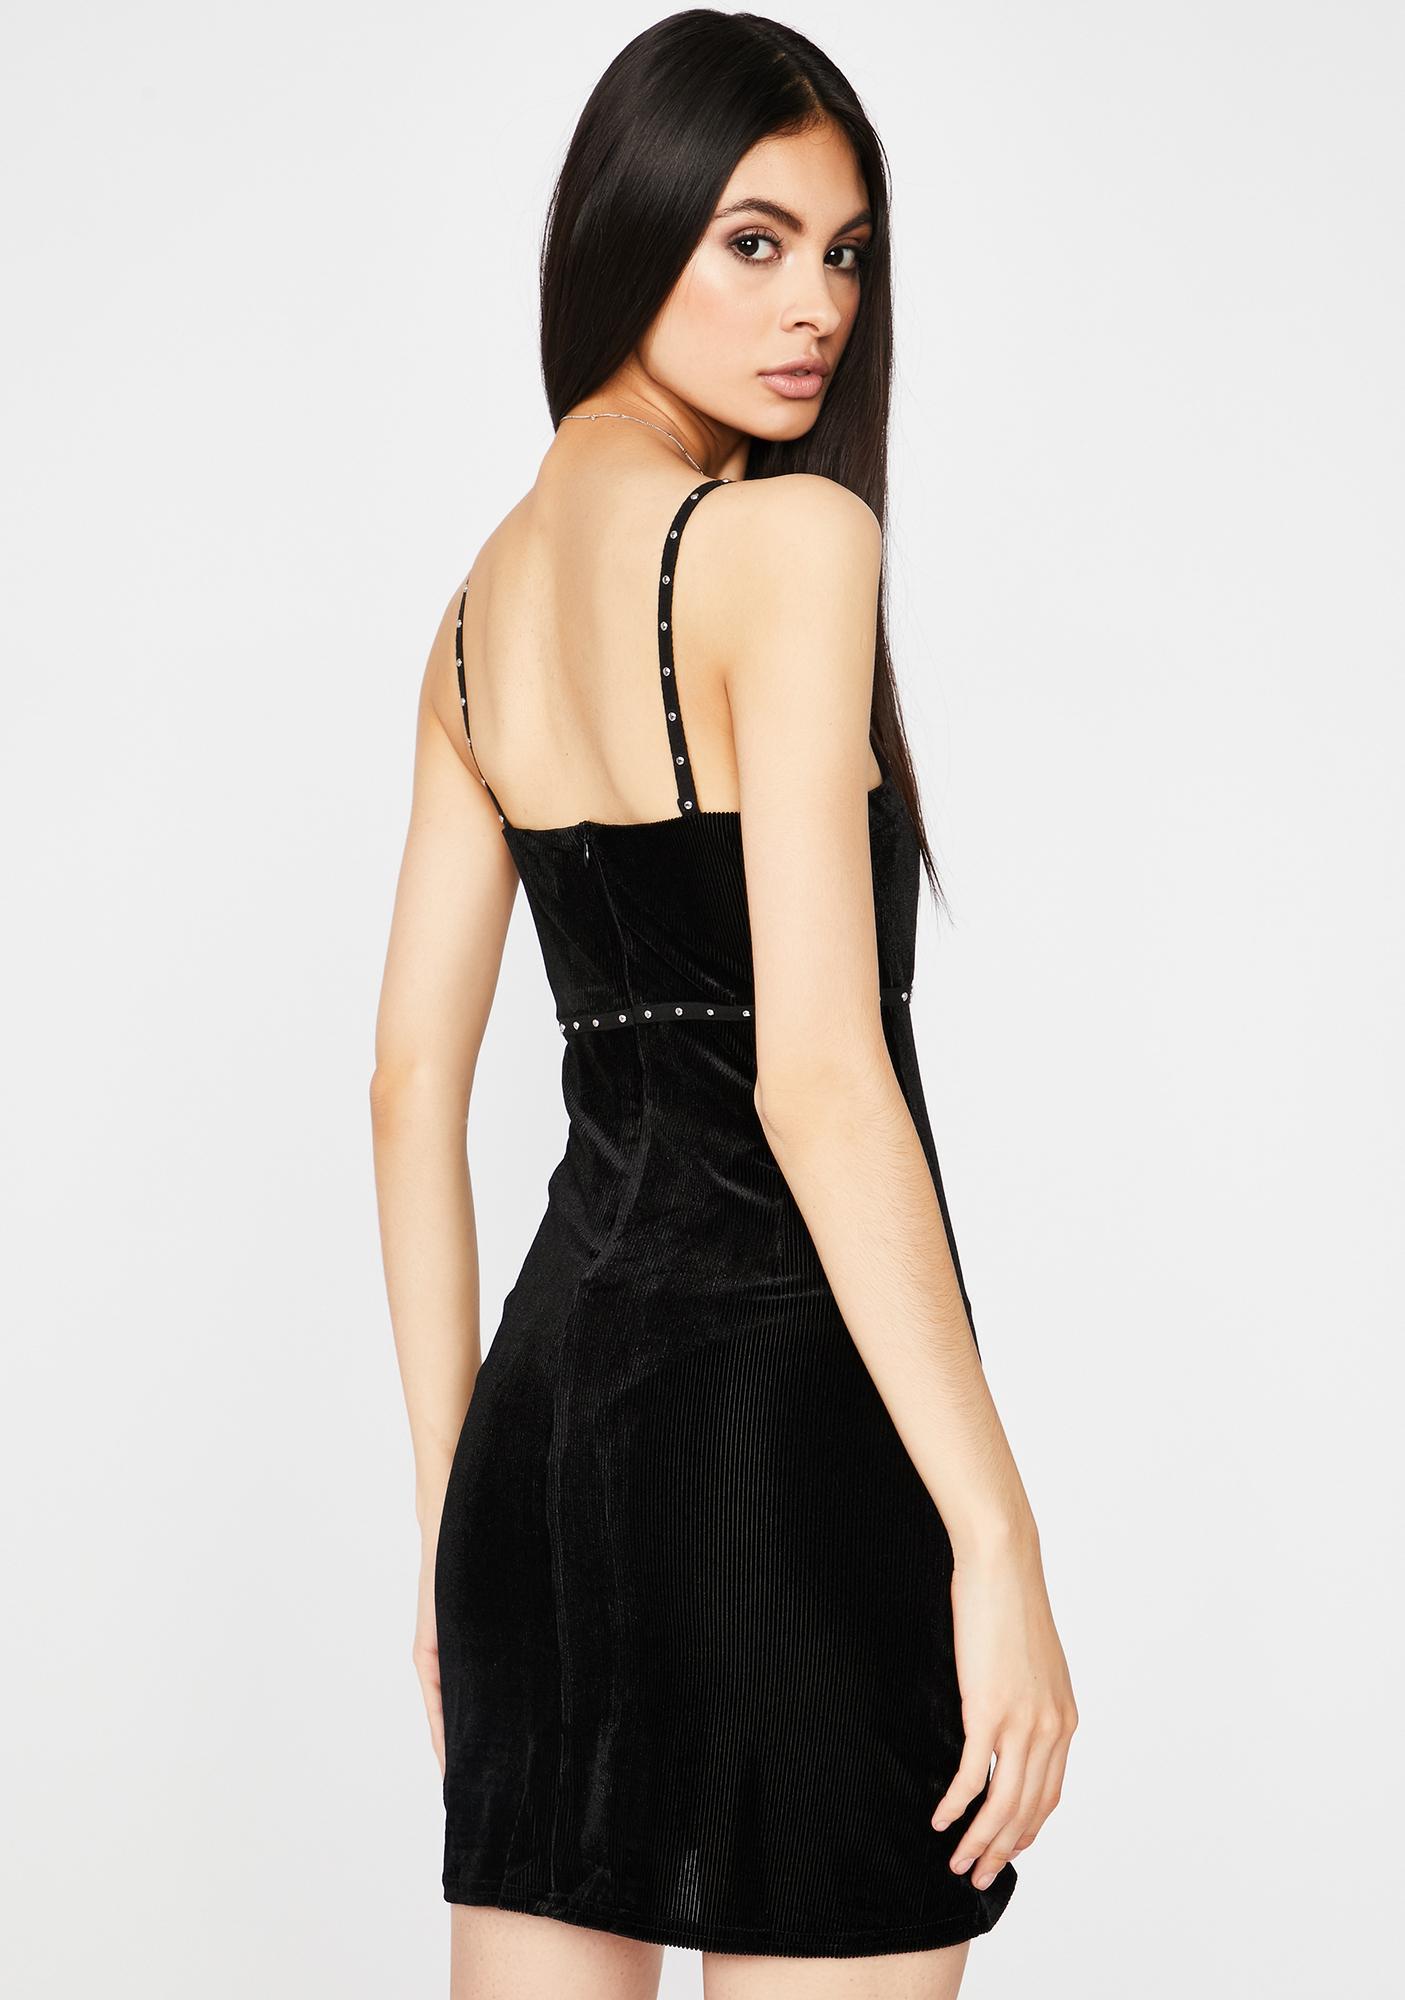 Fashionably Late Studded Dress